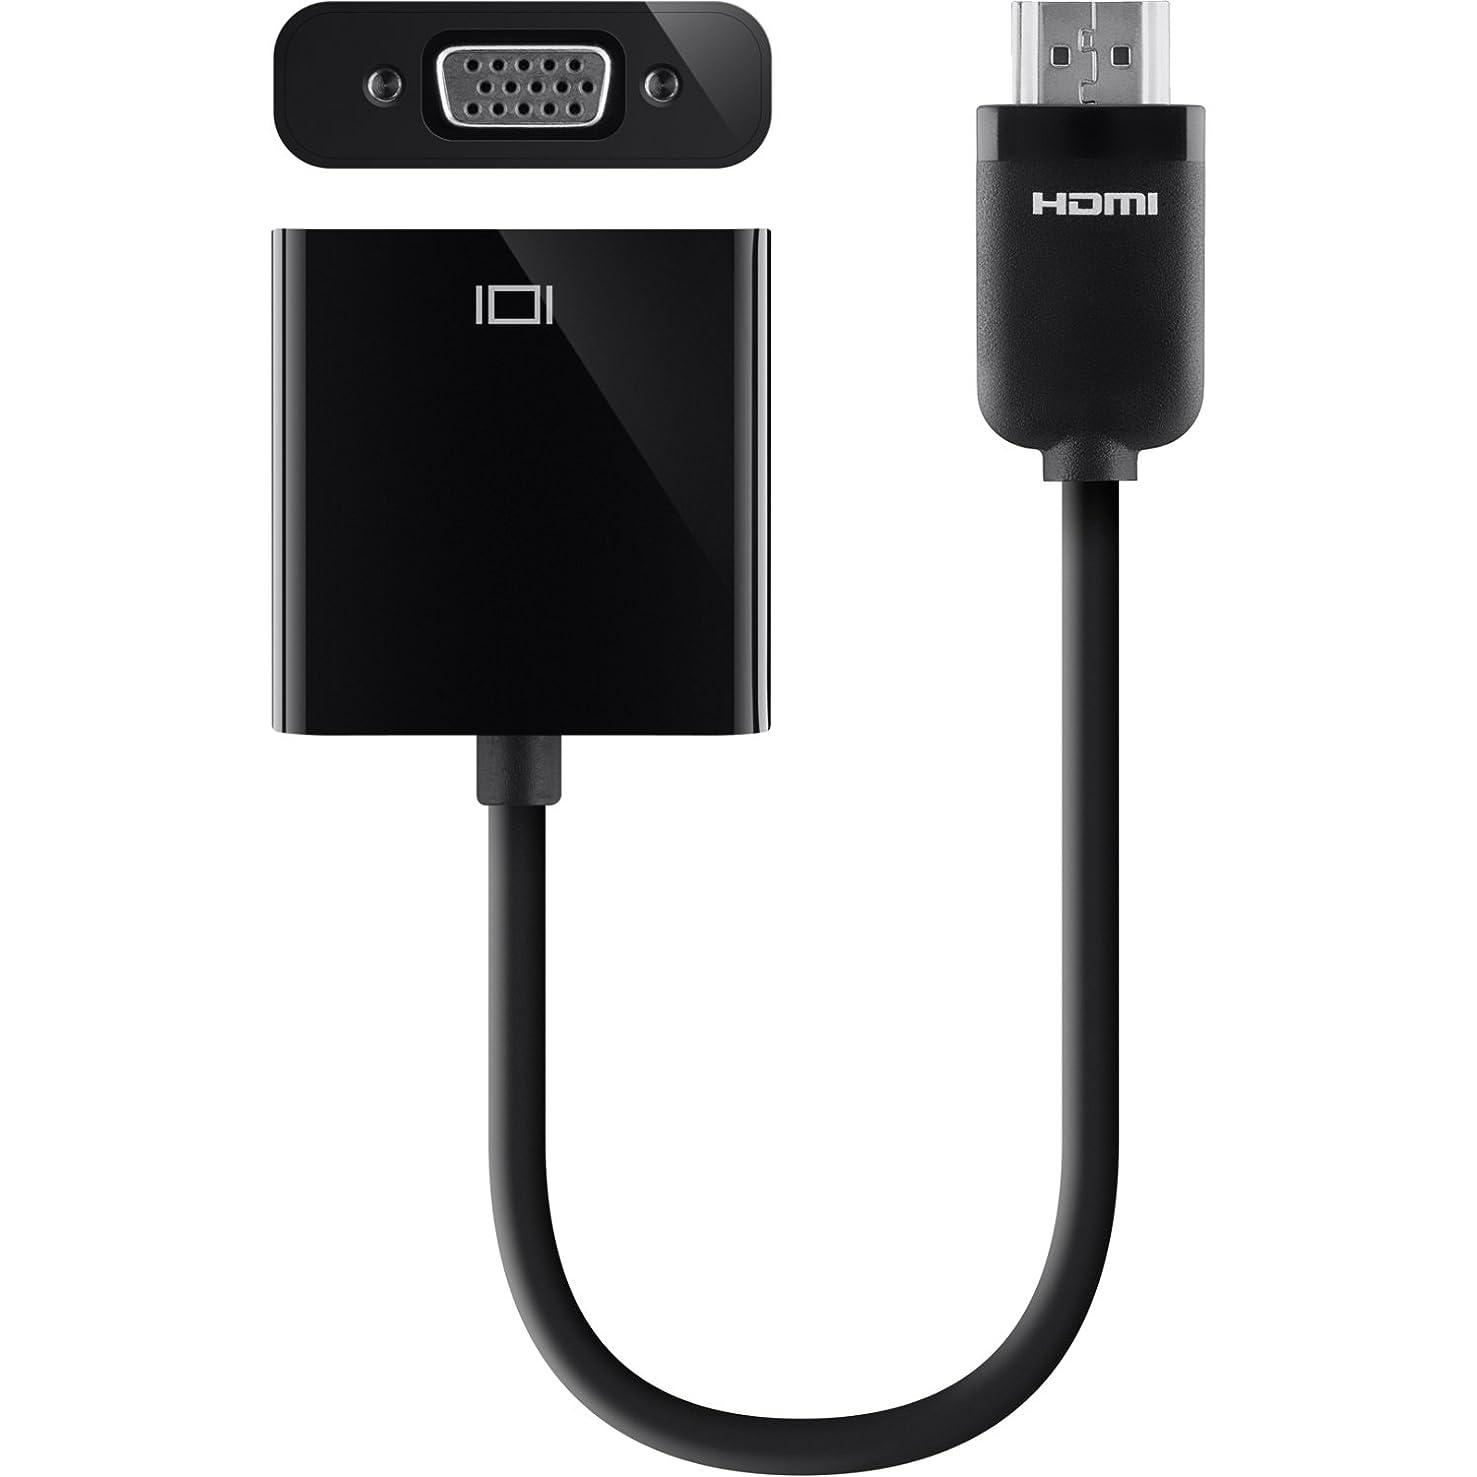 Belkin AV10145BT HDMI/VGA Video Cable - HDMI/VGA for Video Device, Projector - 5.90